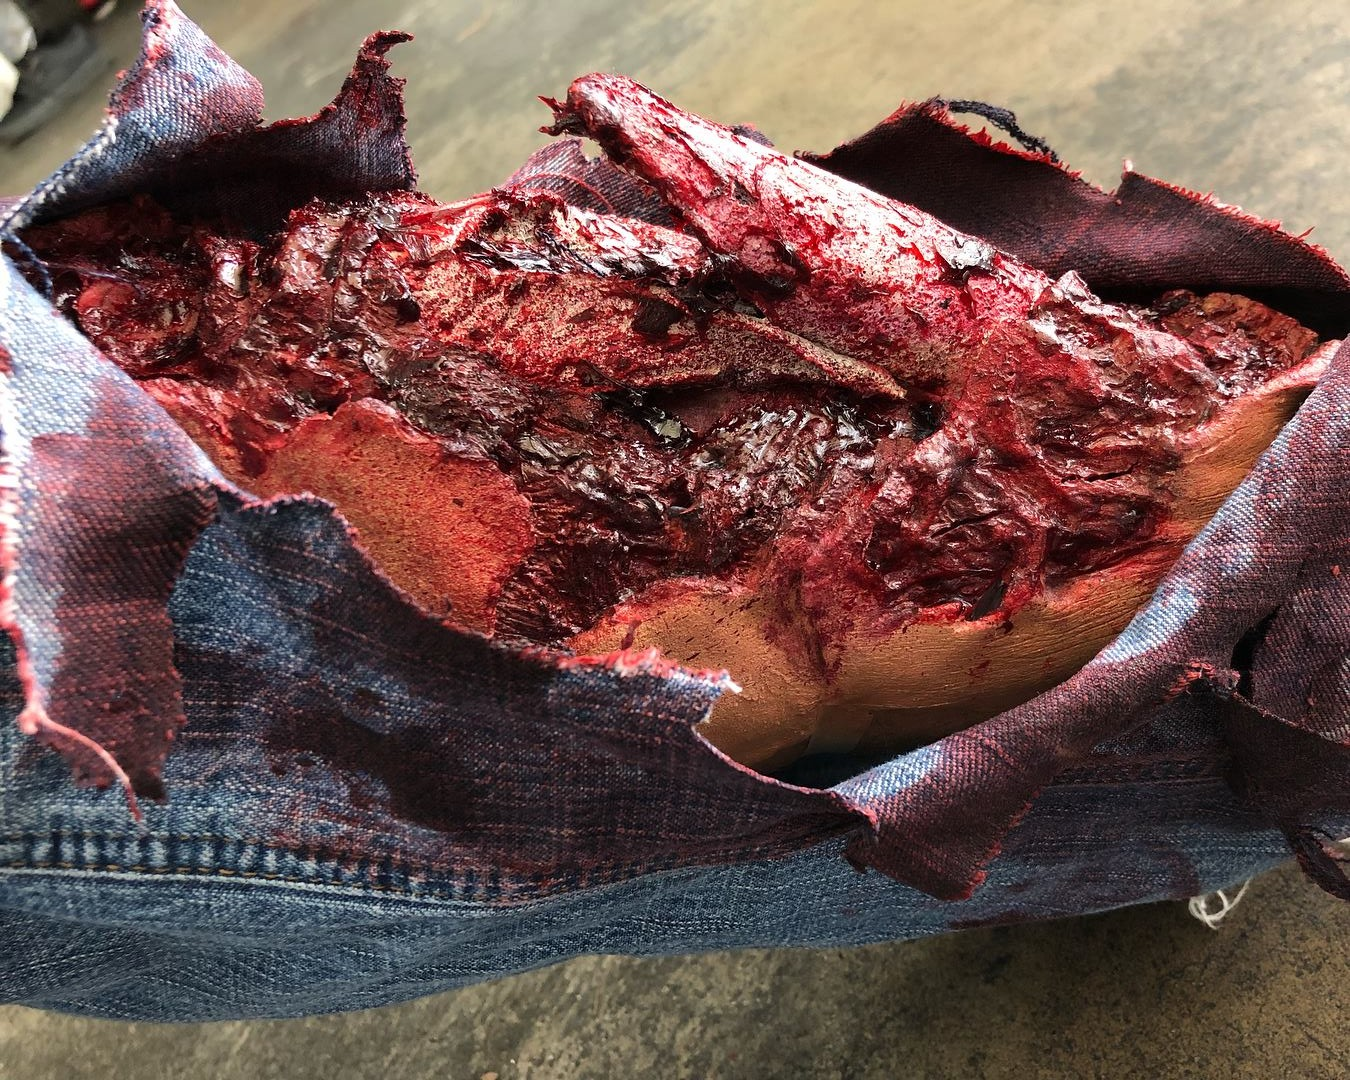 Explosive Injury